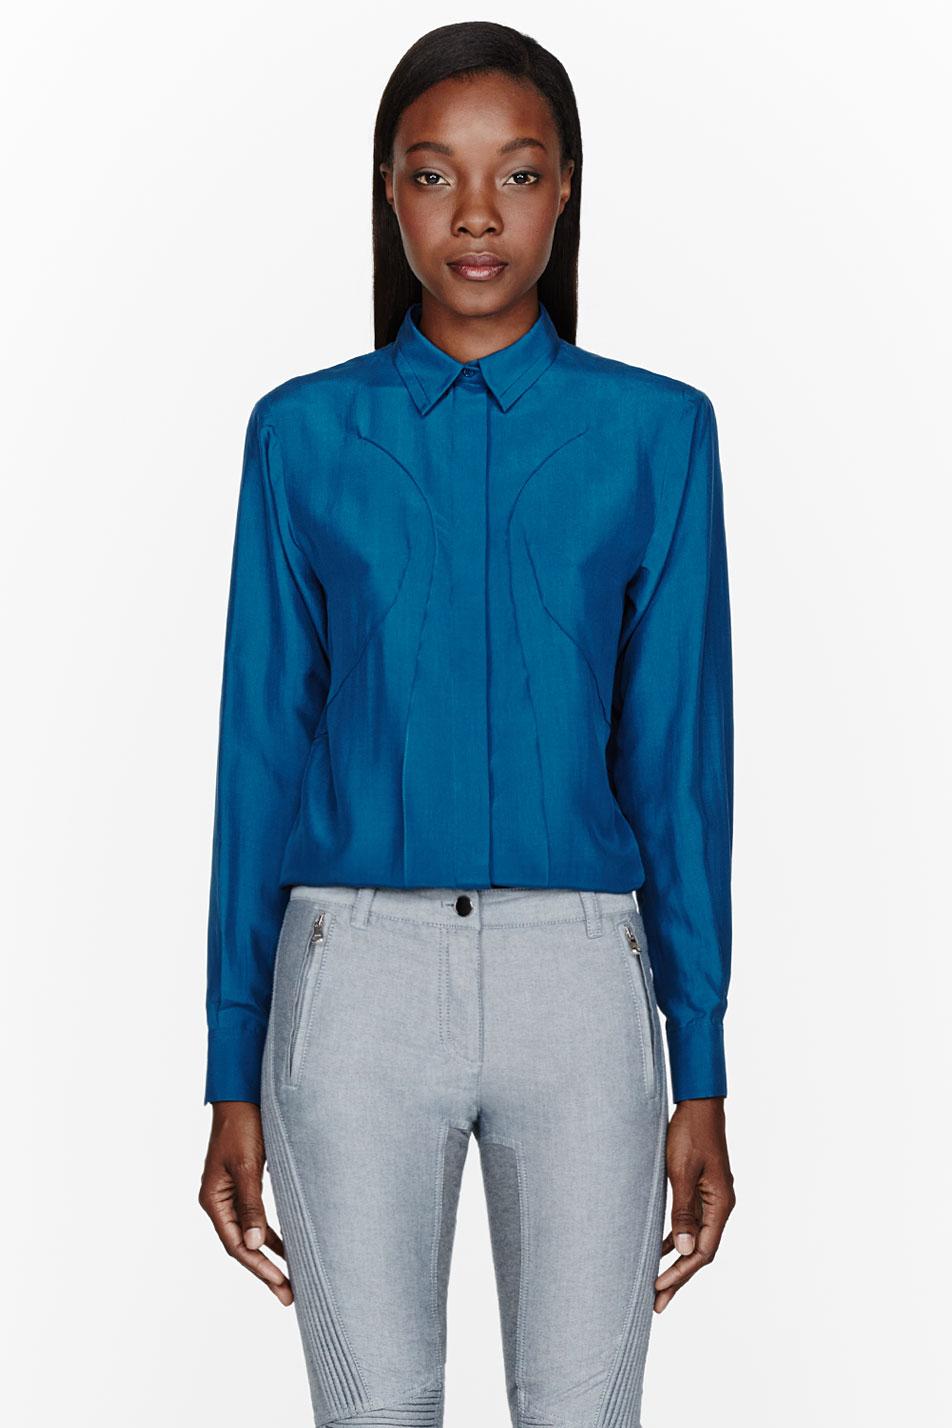 cdric charlier blue silk blouse